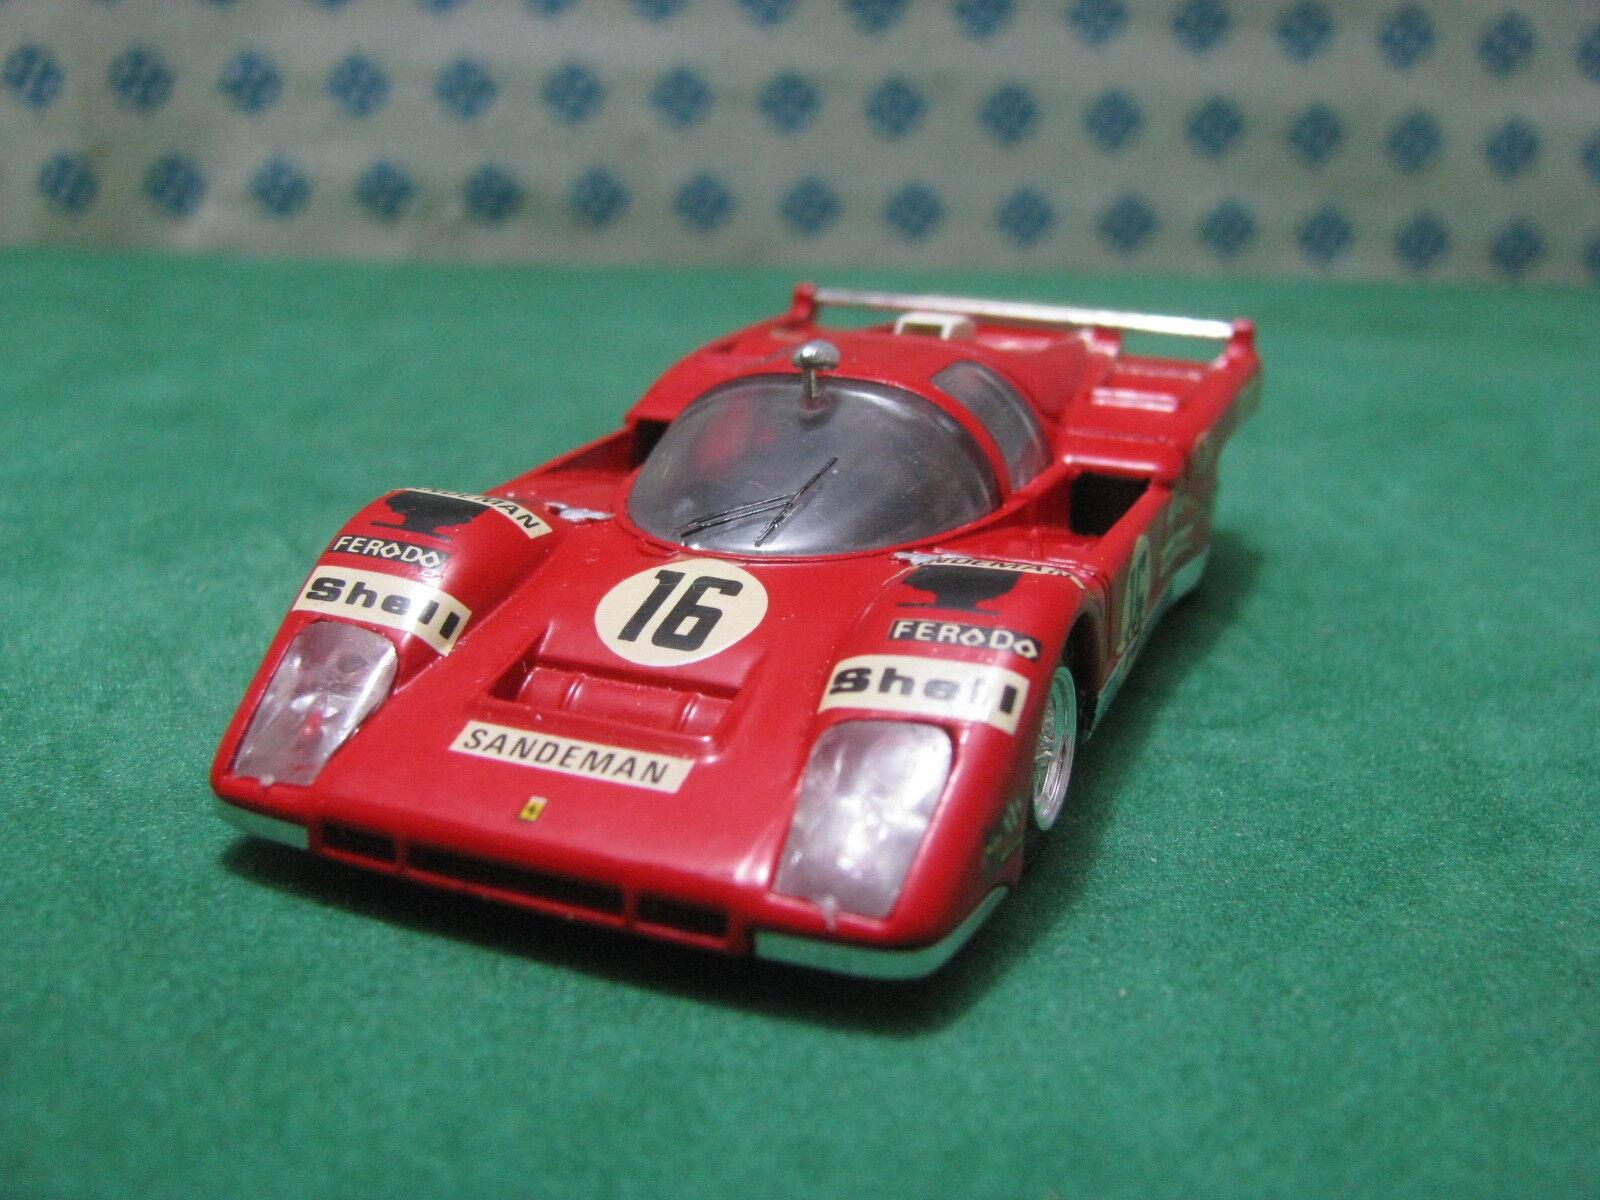 Vintage  -  FERRARI FERRARI FERRARI 512 Le Mans    -  1 43 Solido Ref. 197 f31a4f